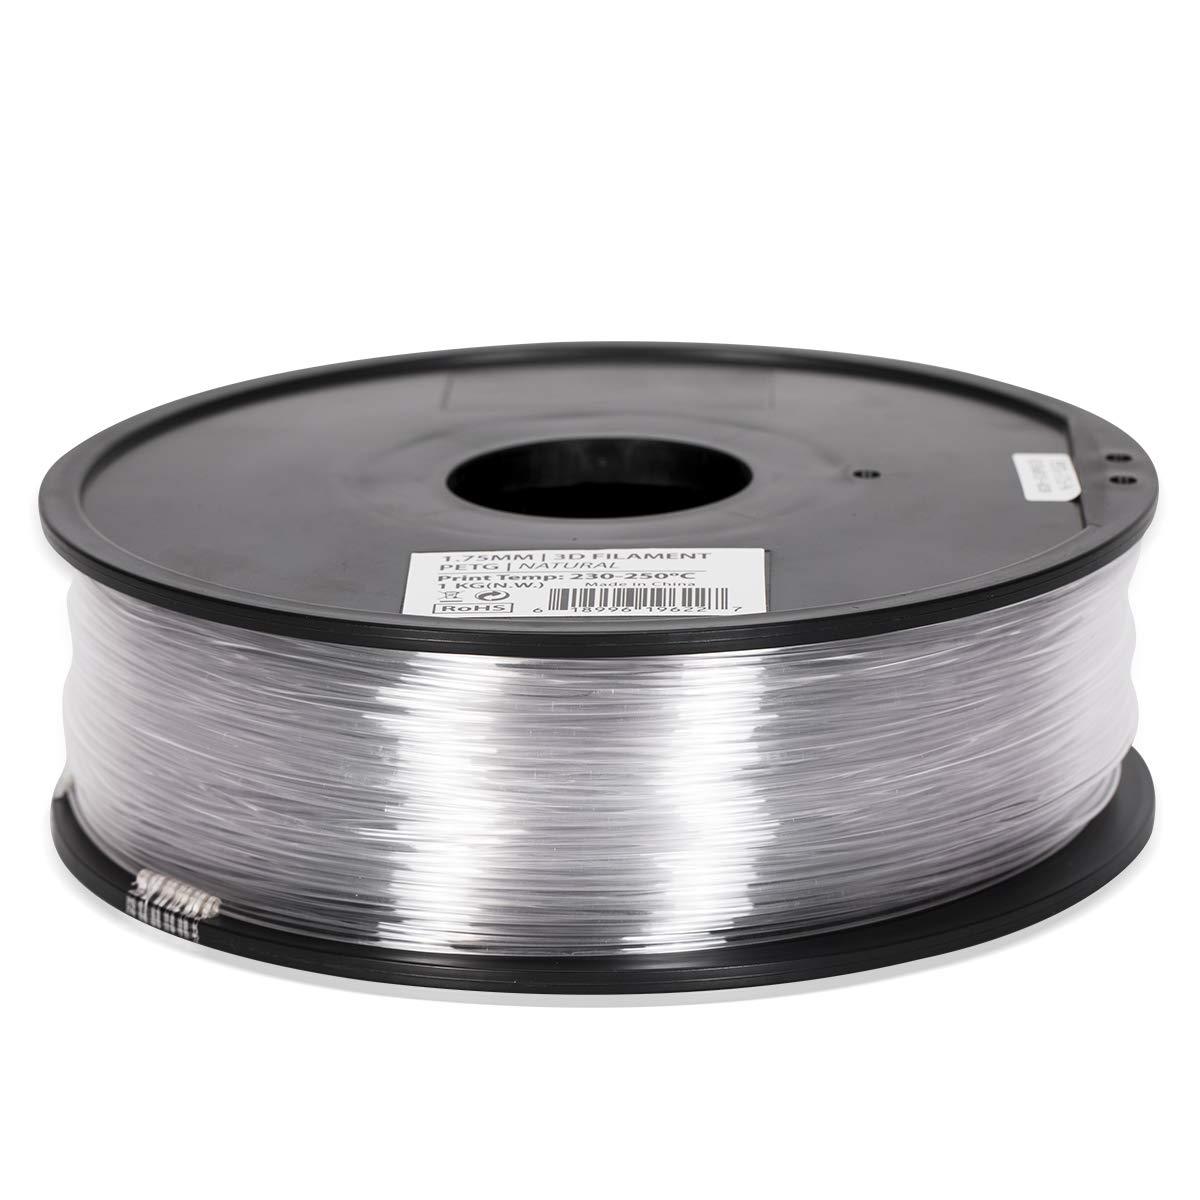 PETG Filament- 1.75 - Clear Translucent - Inland